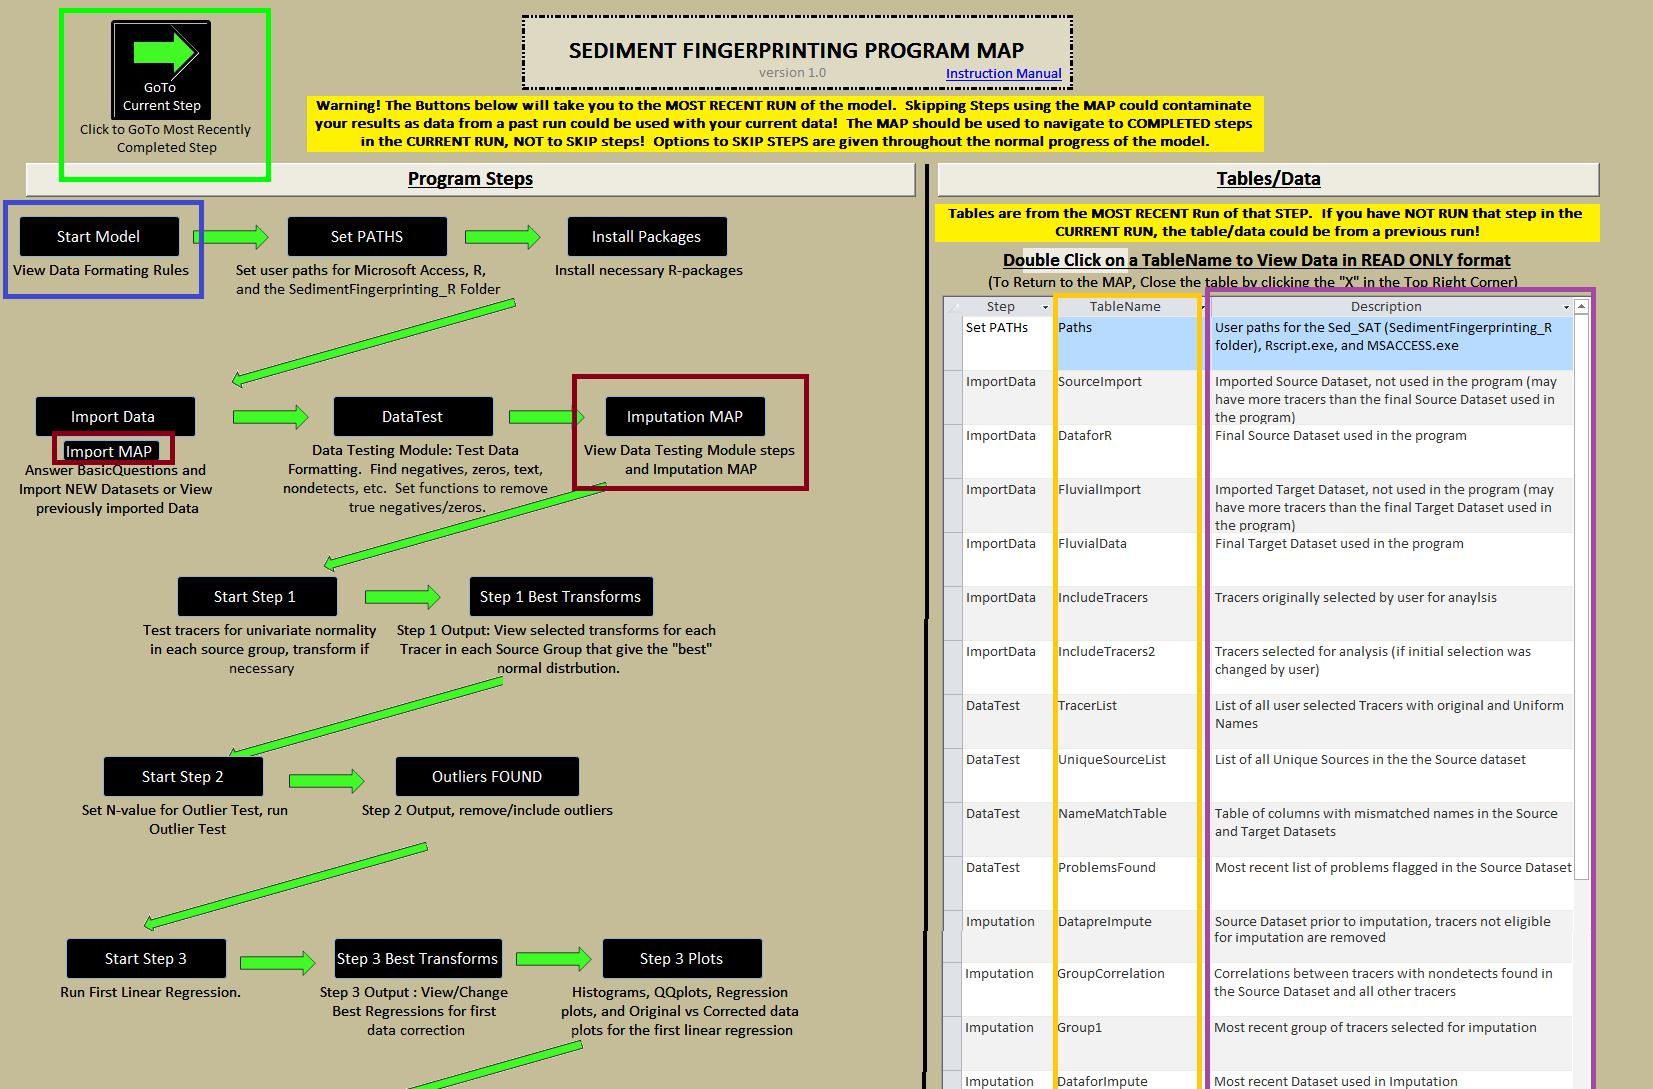 SedimentFingerprinting_R/readMeImages/Figure7top.png